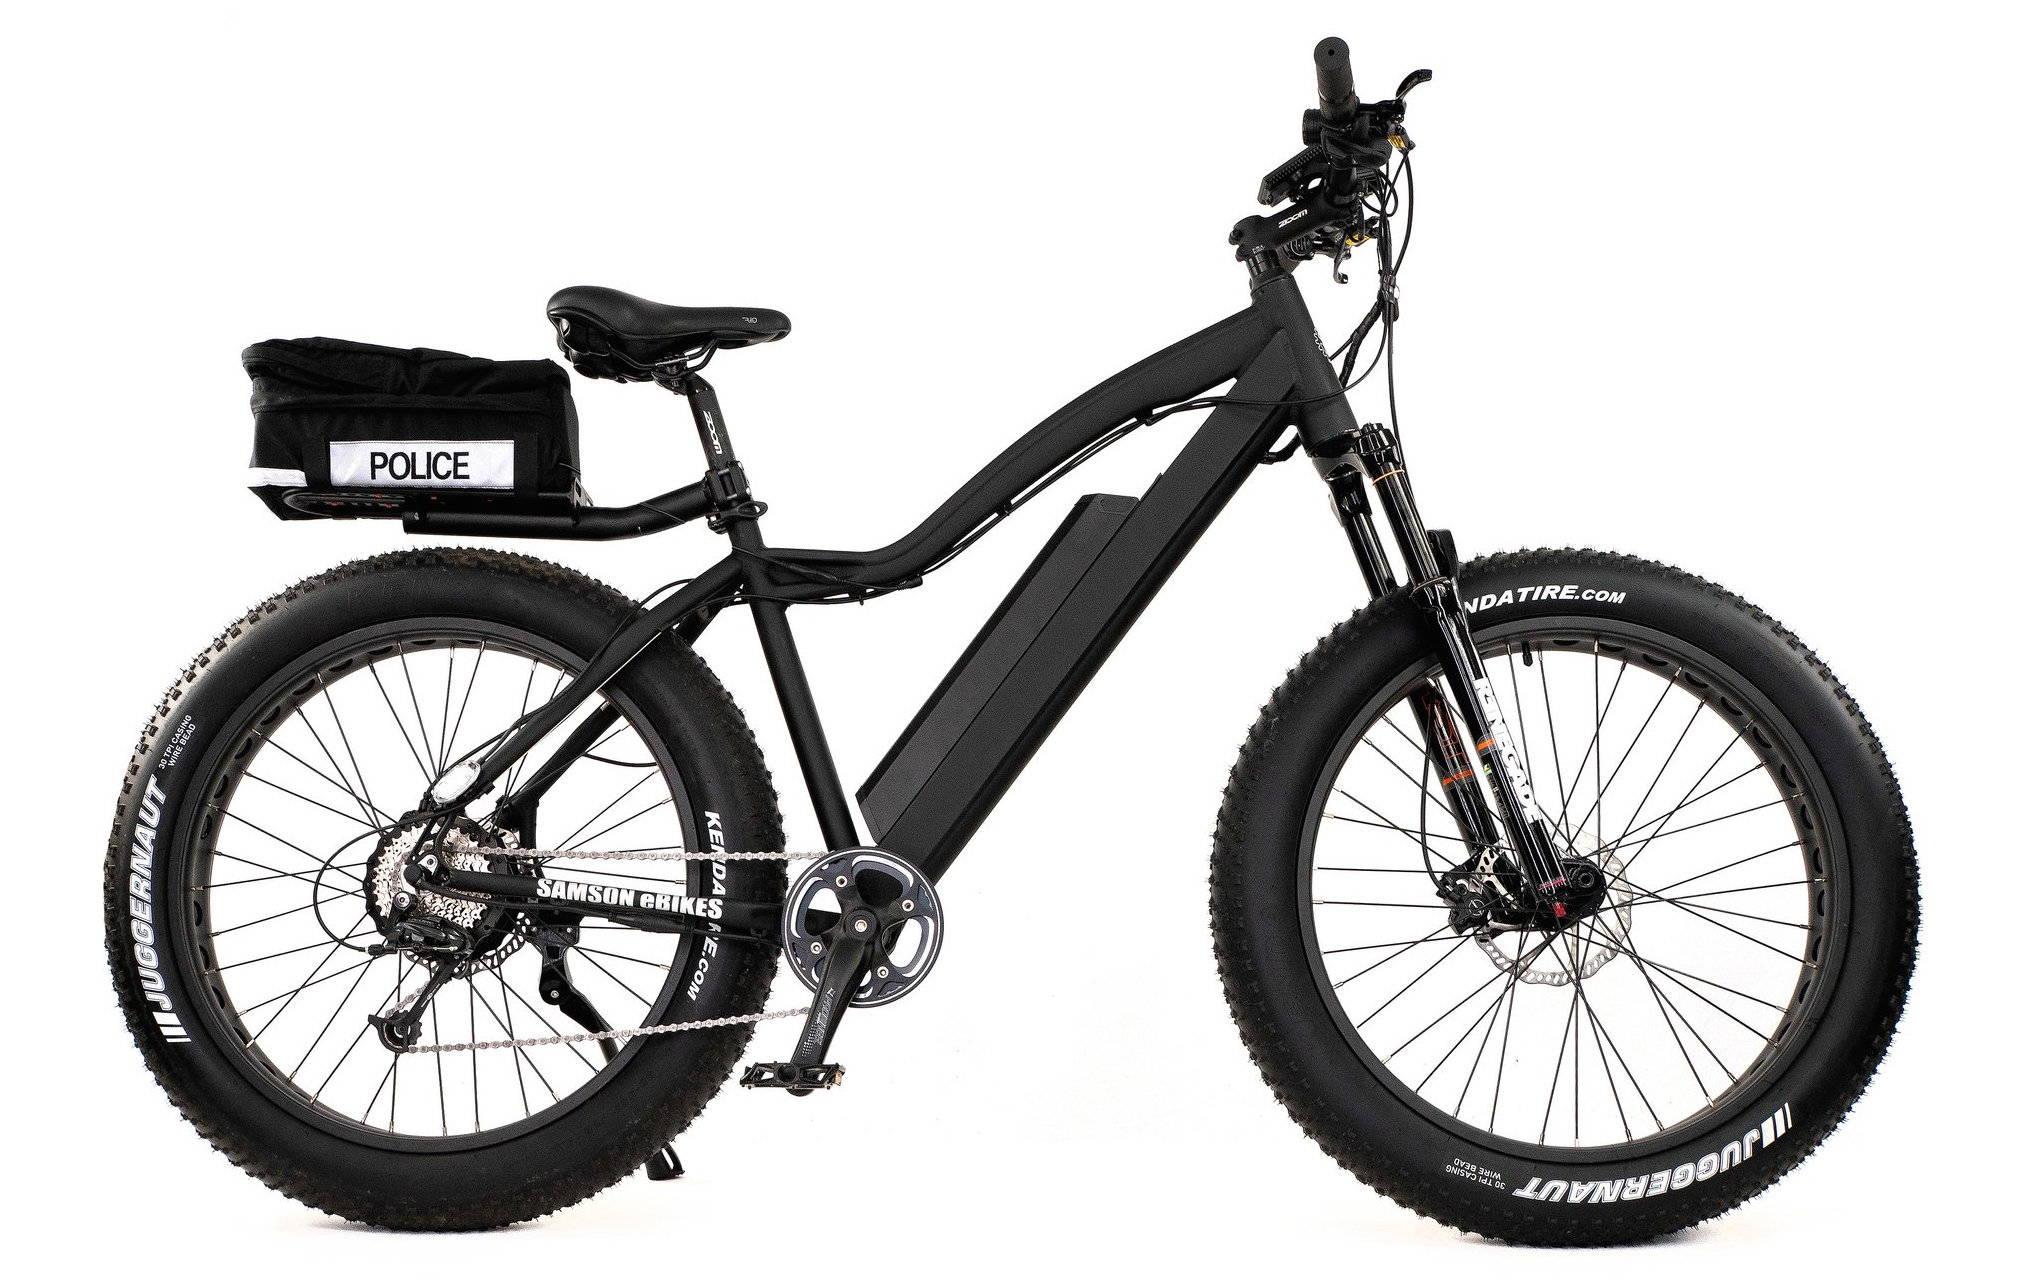 Police E-Bikes